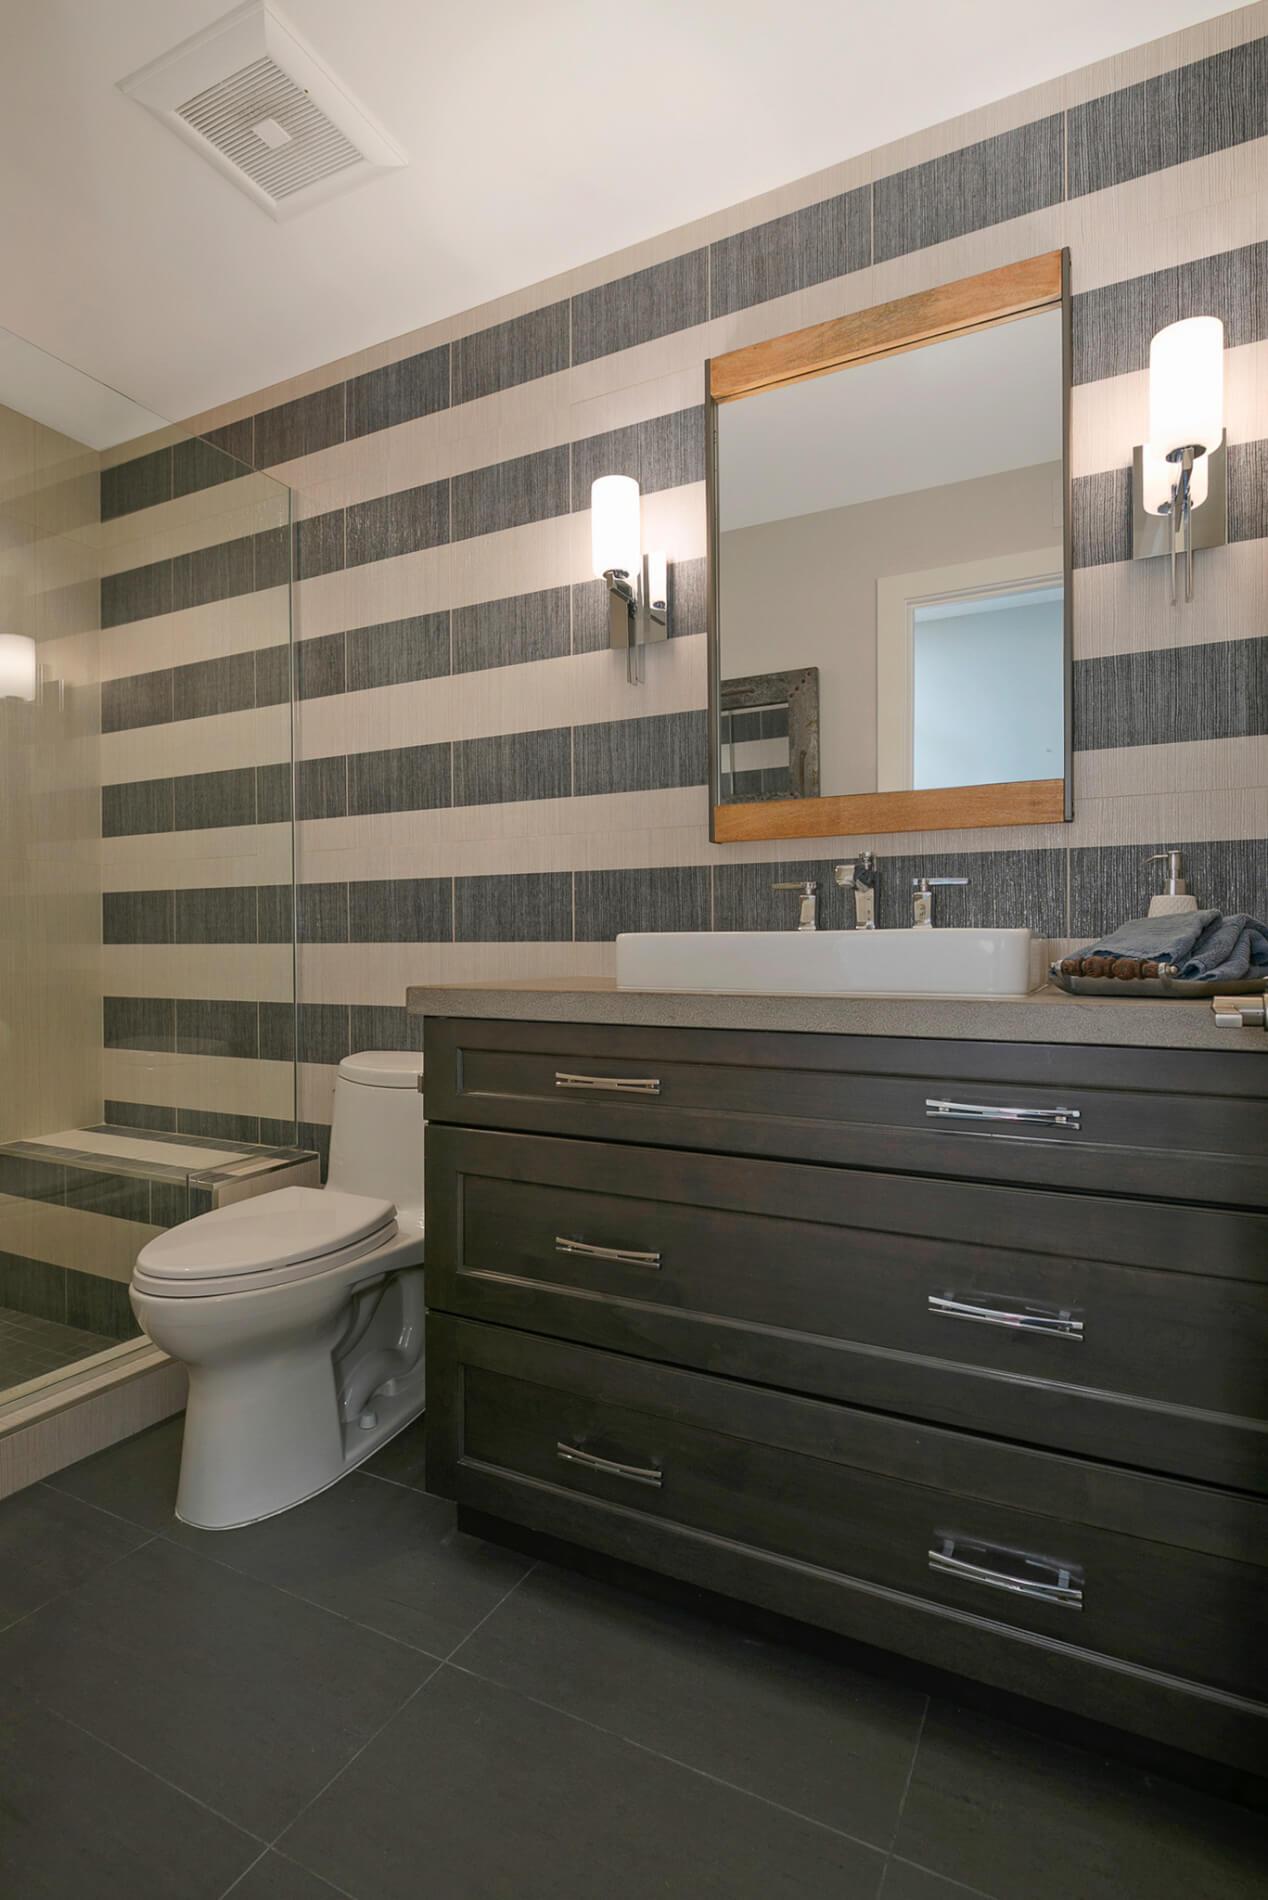 Secondary Bathroom in Orange County, San Clemente Secondary Bathroom, Unique and Custom Secondary Bathroom Design